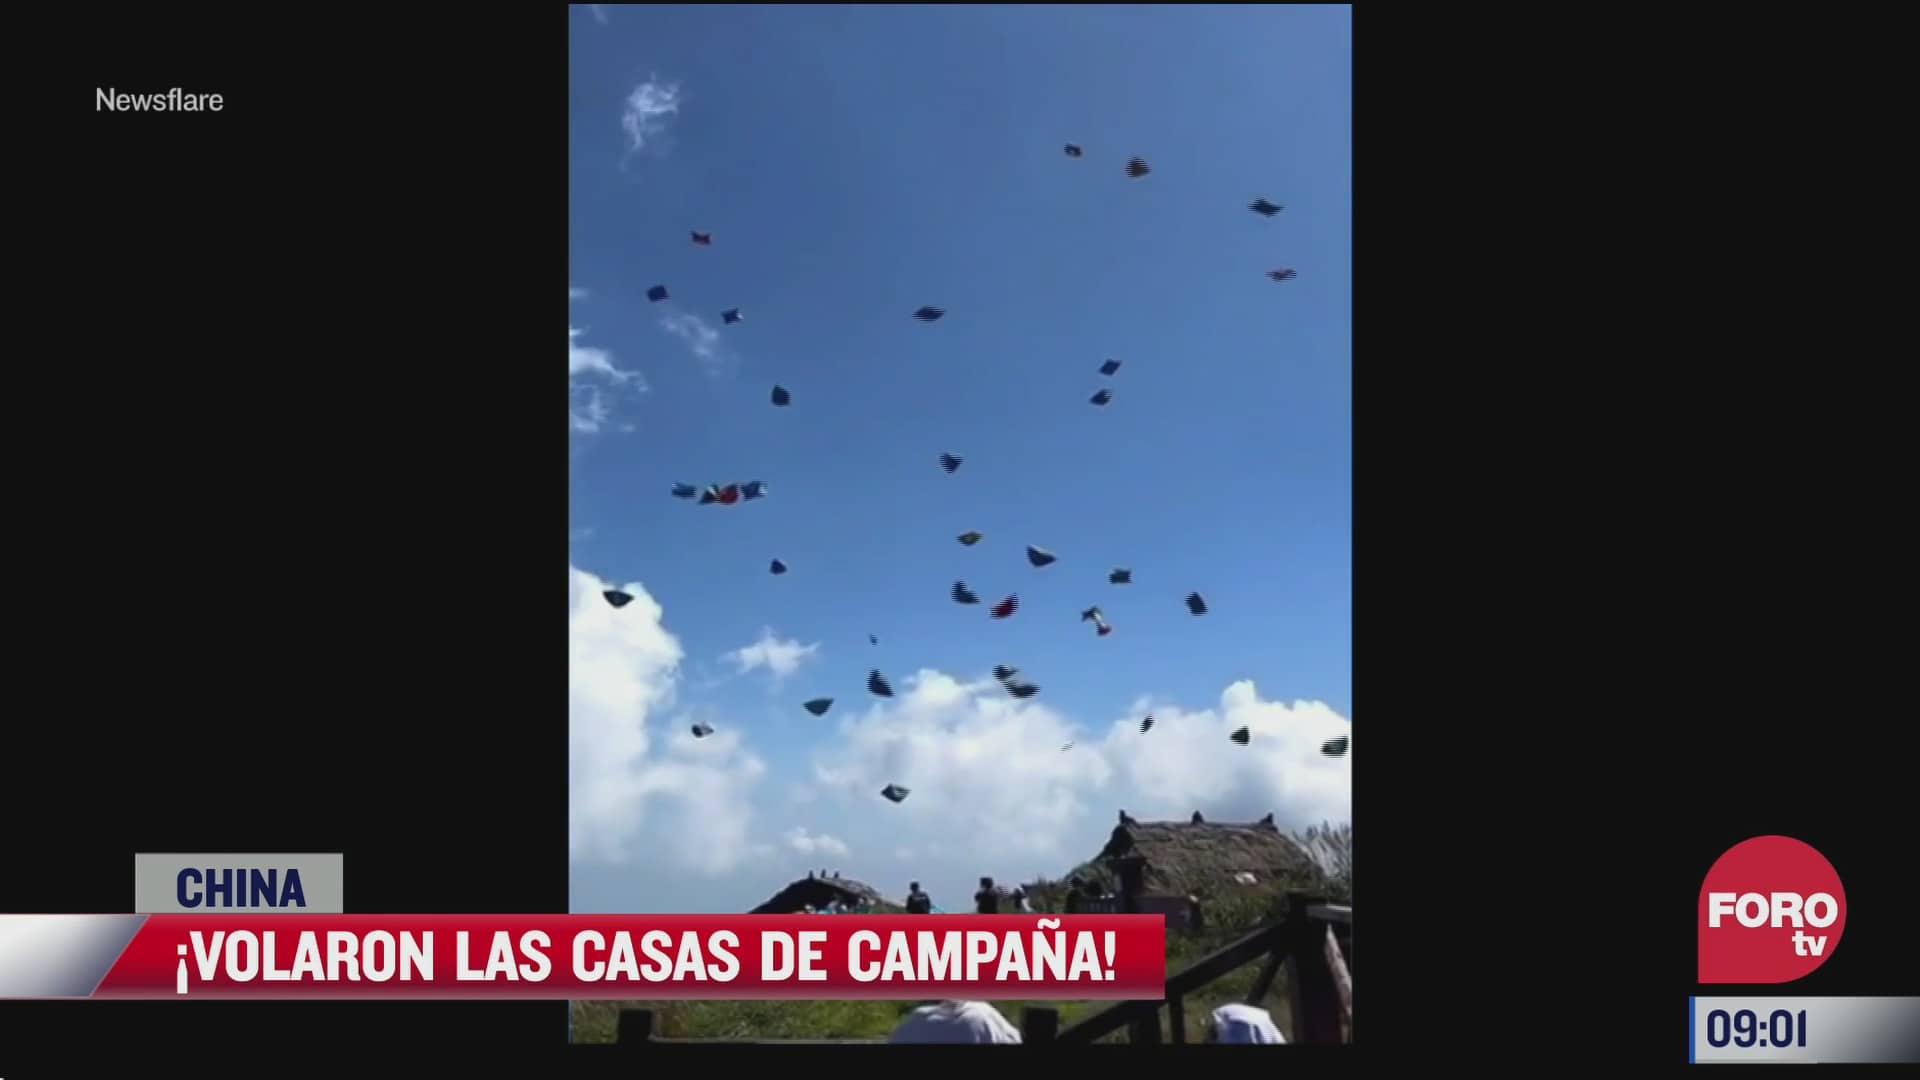 casas de campana salen volando en china